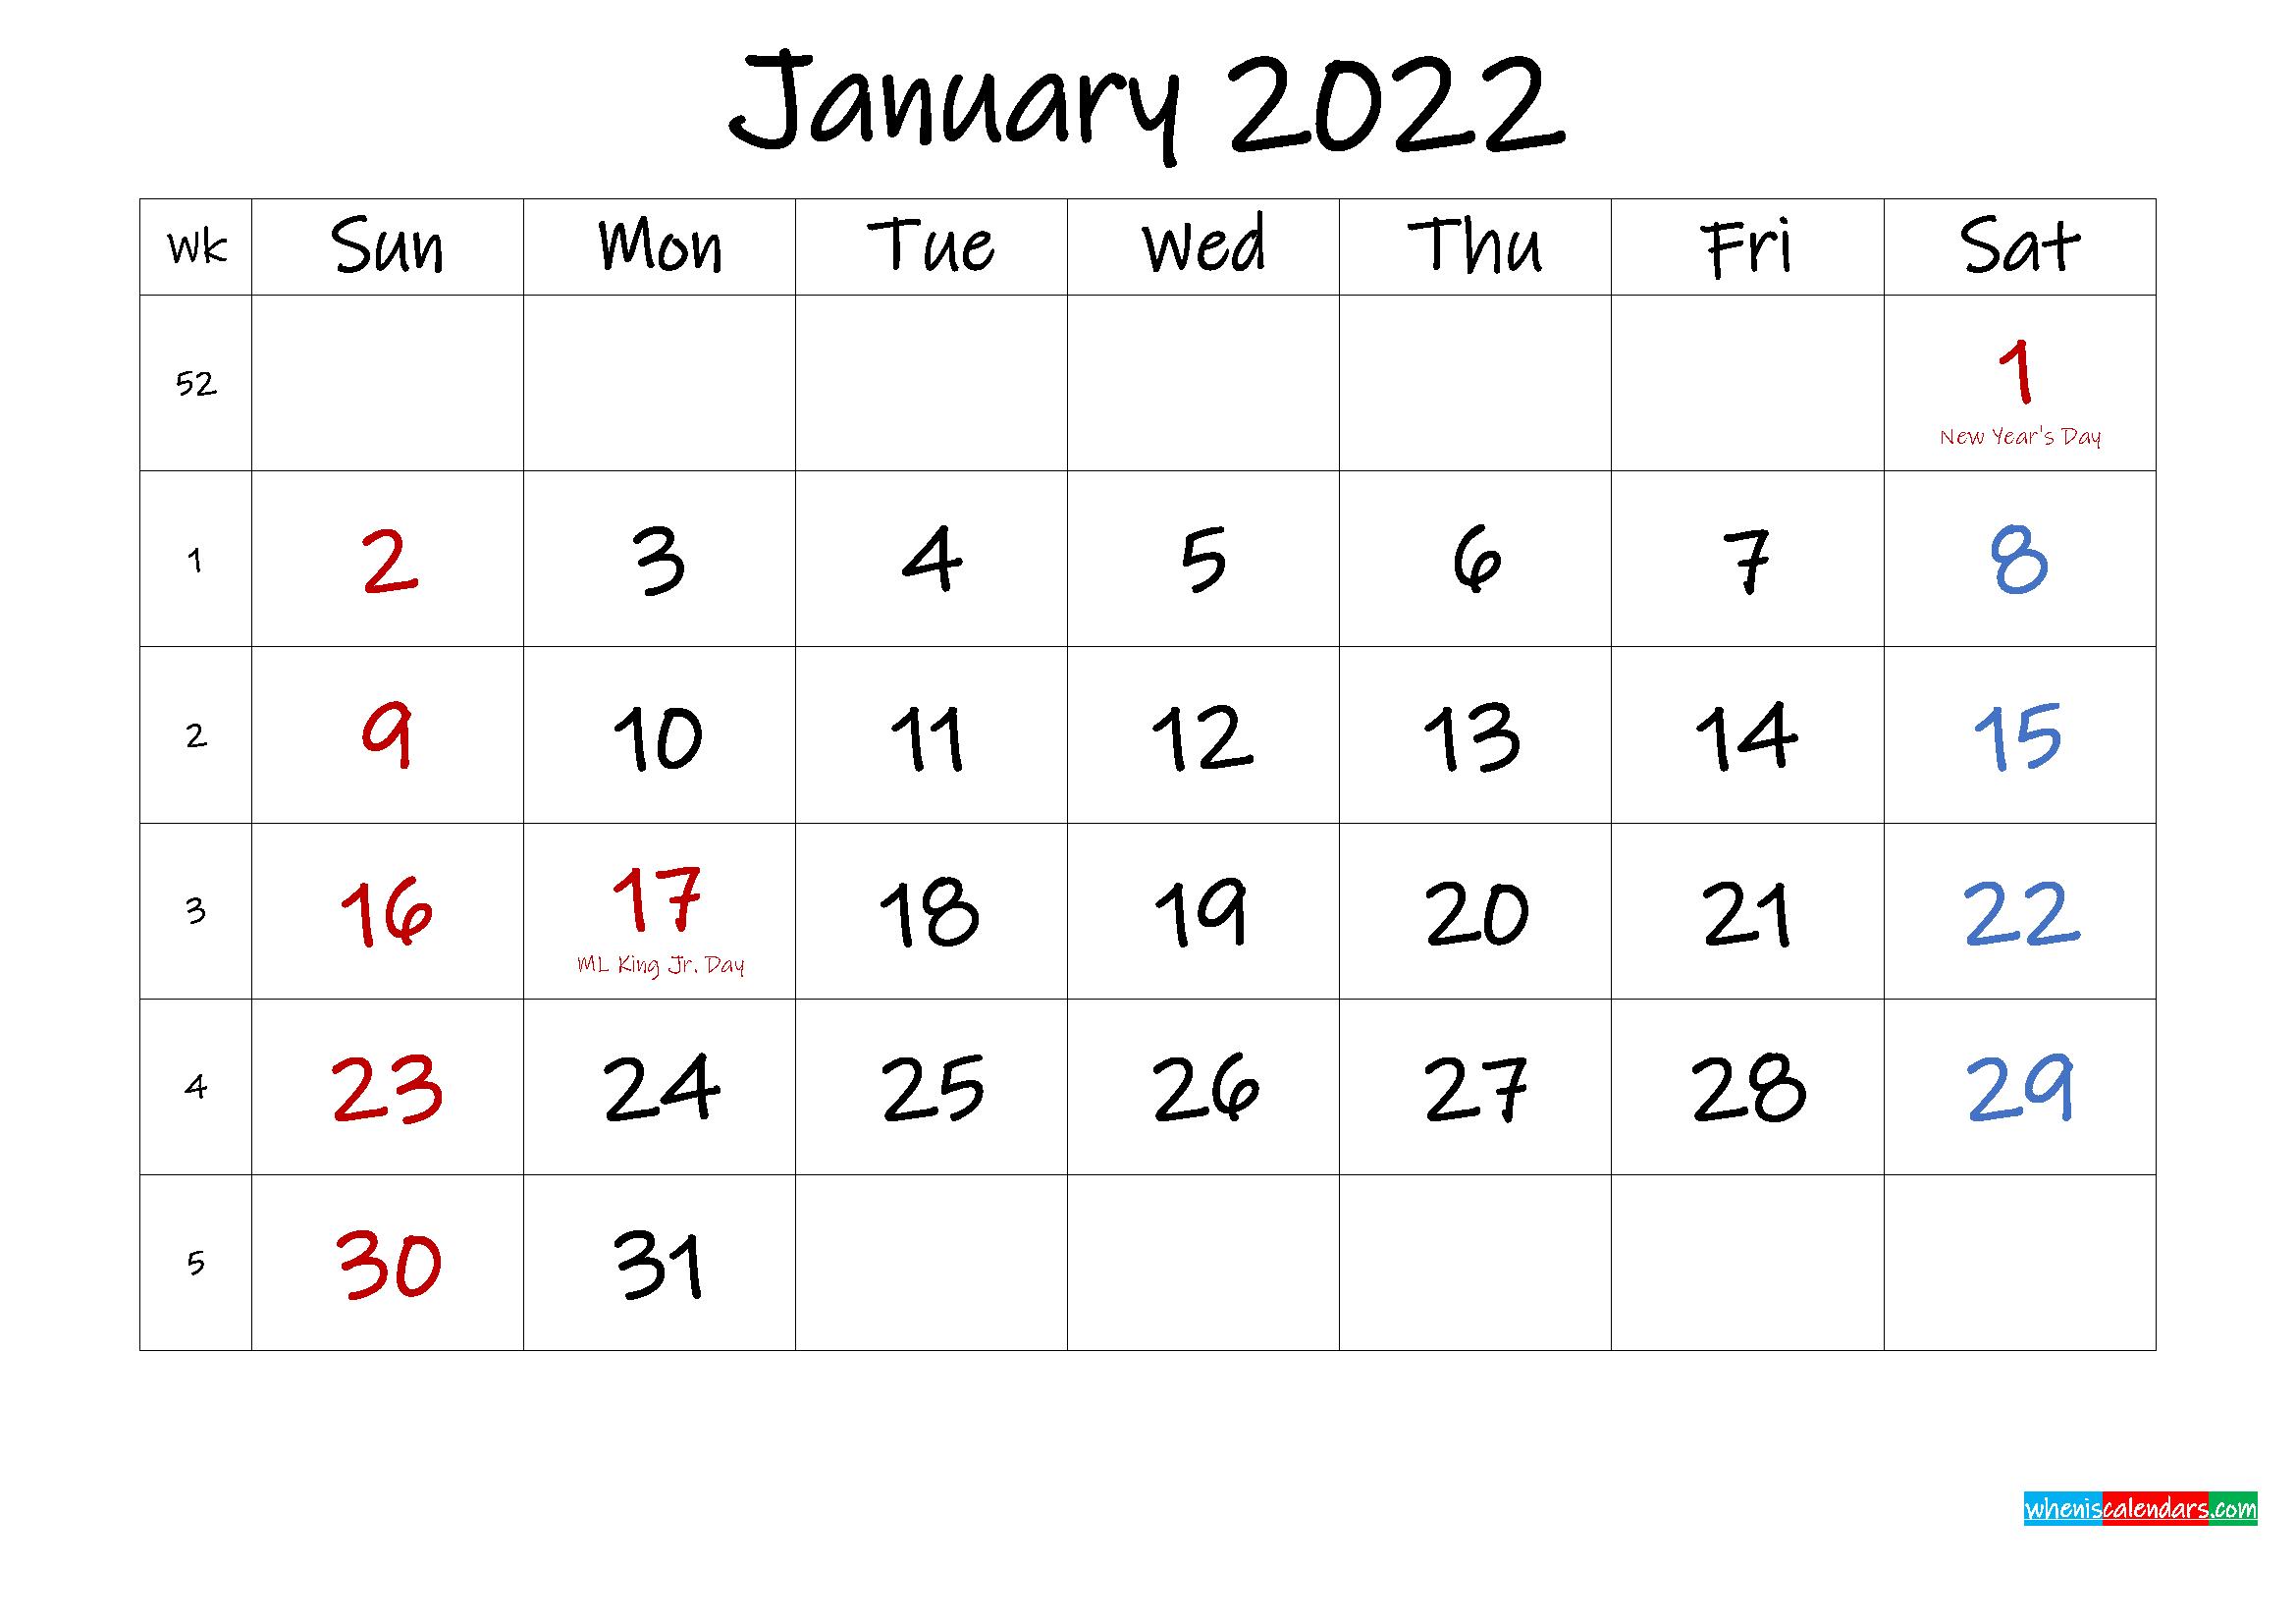 January 2022 Free Printable Calendar With Holidays intended for Free Printable Printable Pdf January 2022 Calendar Photo